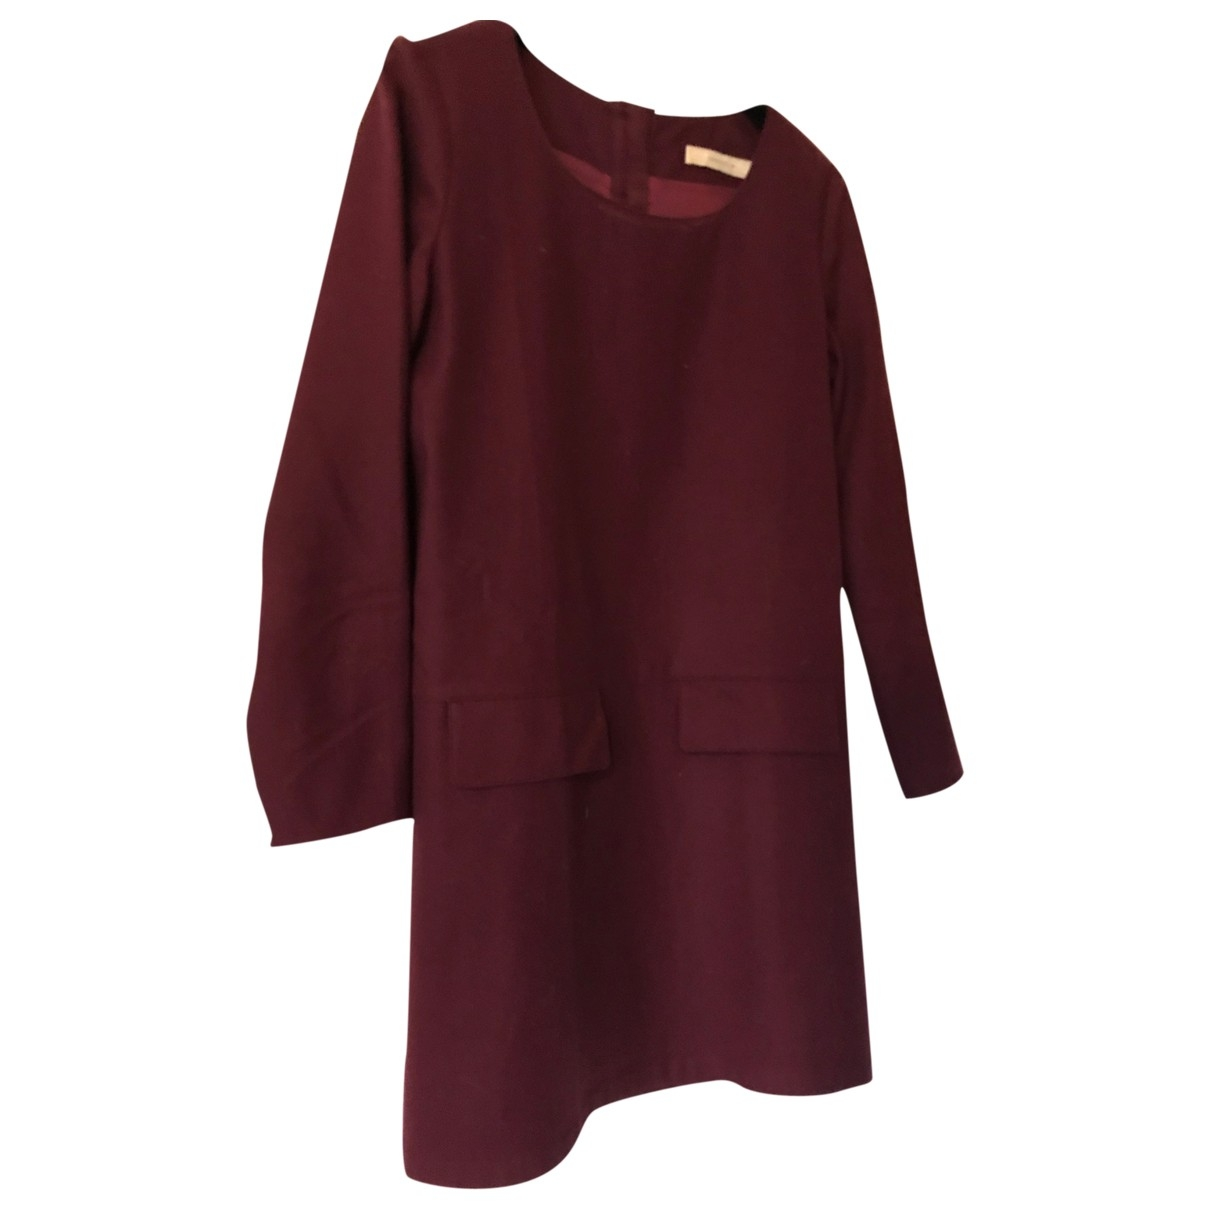 Sessun \N Kleid in  Bordeauxrot Wolle